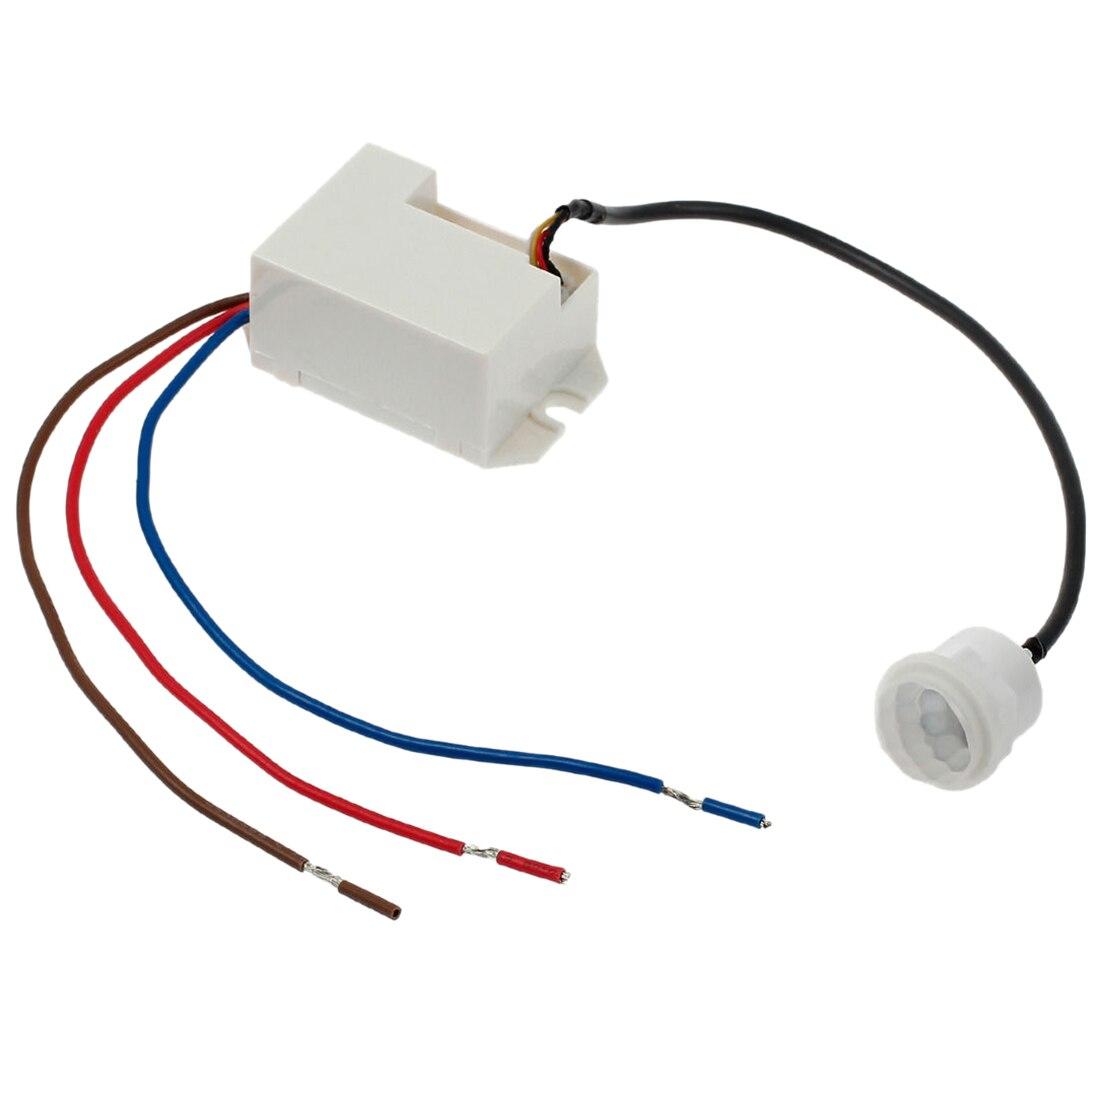 360 Degree Recessed PIR Sensor Detector Ceiling Occupancy Motion Light Switch